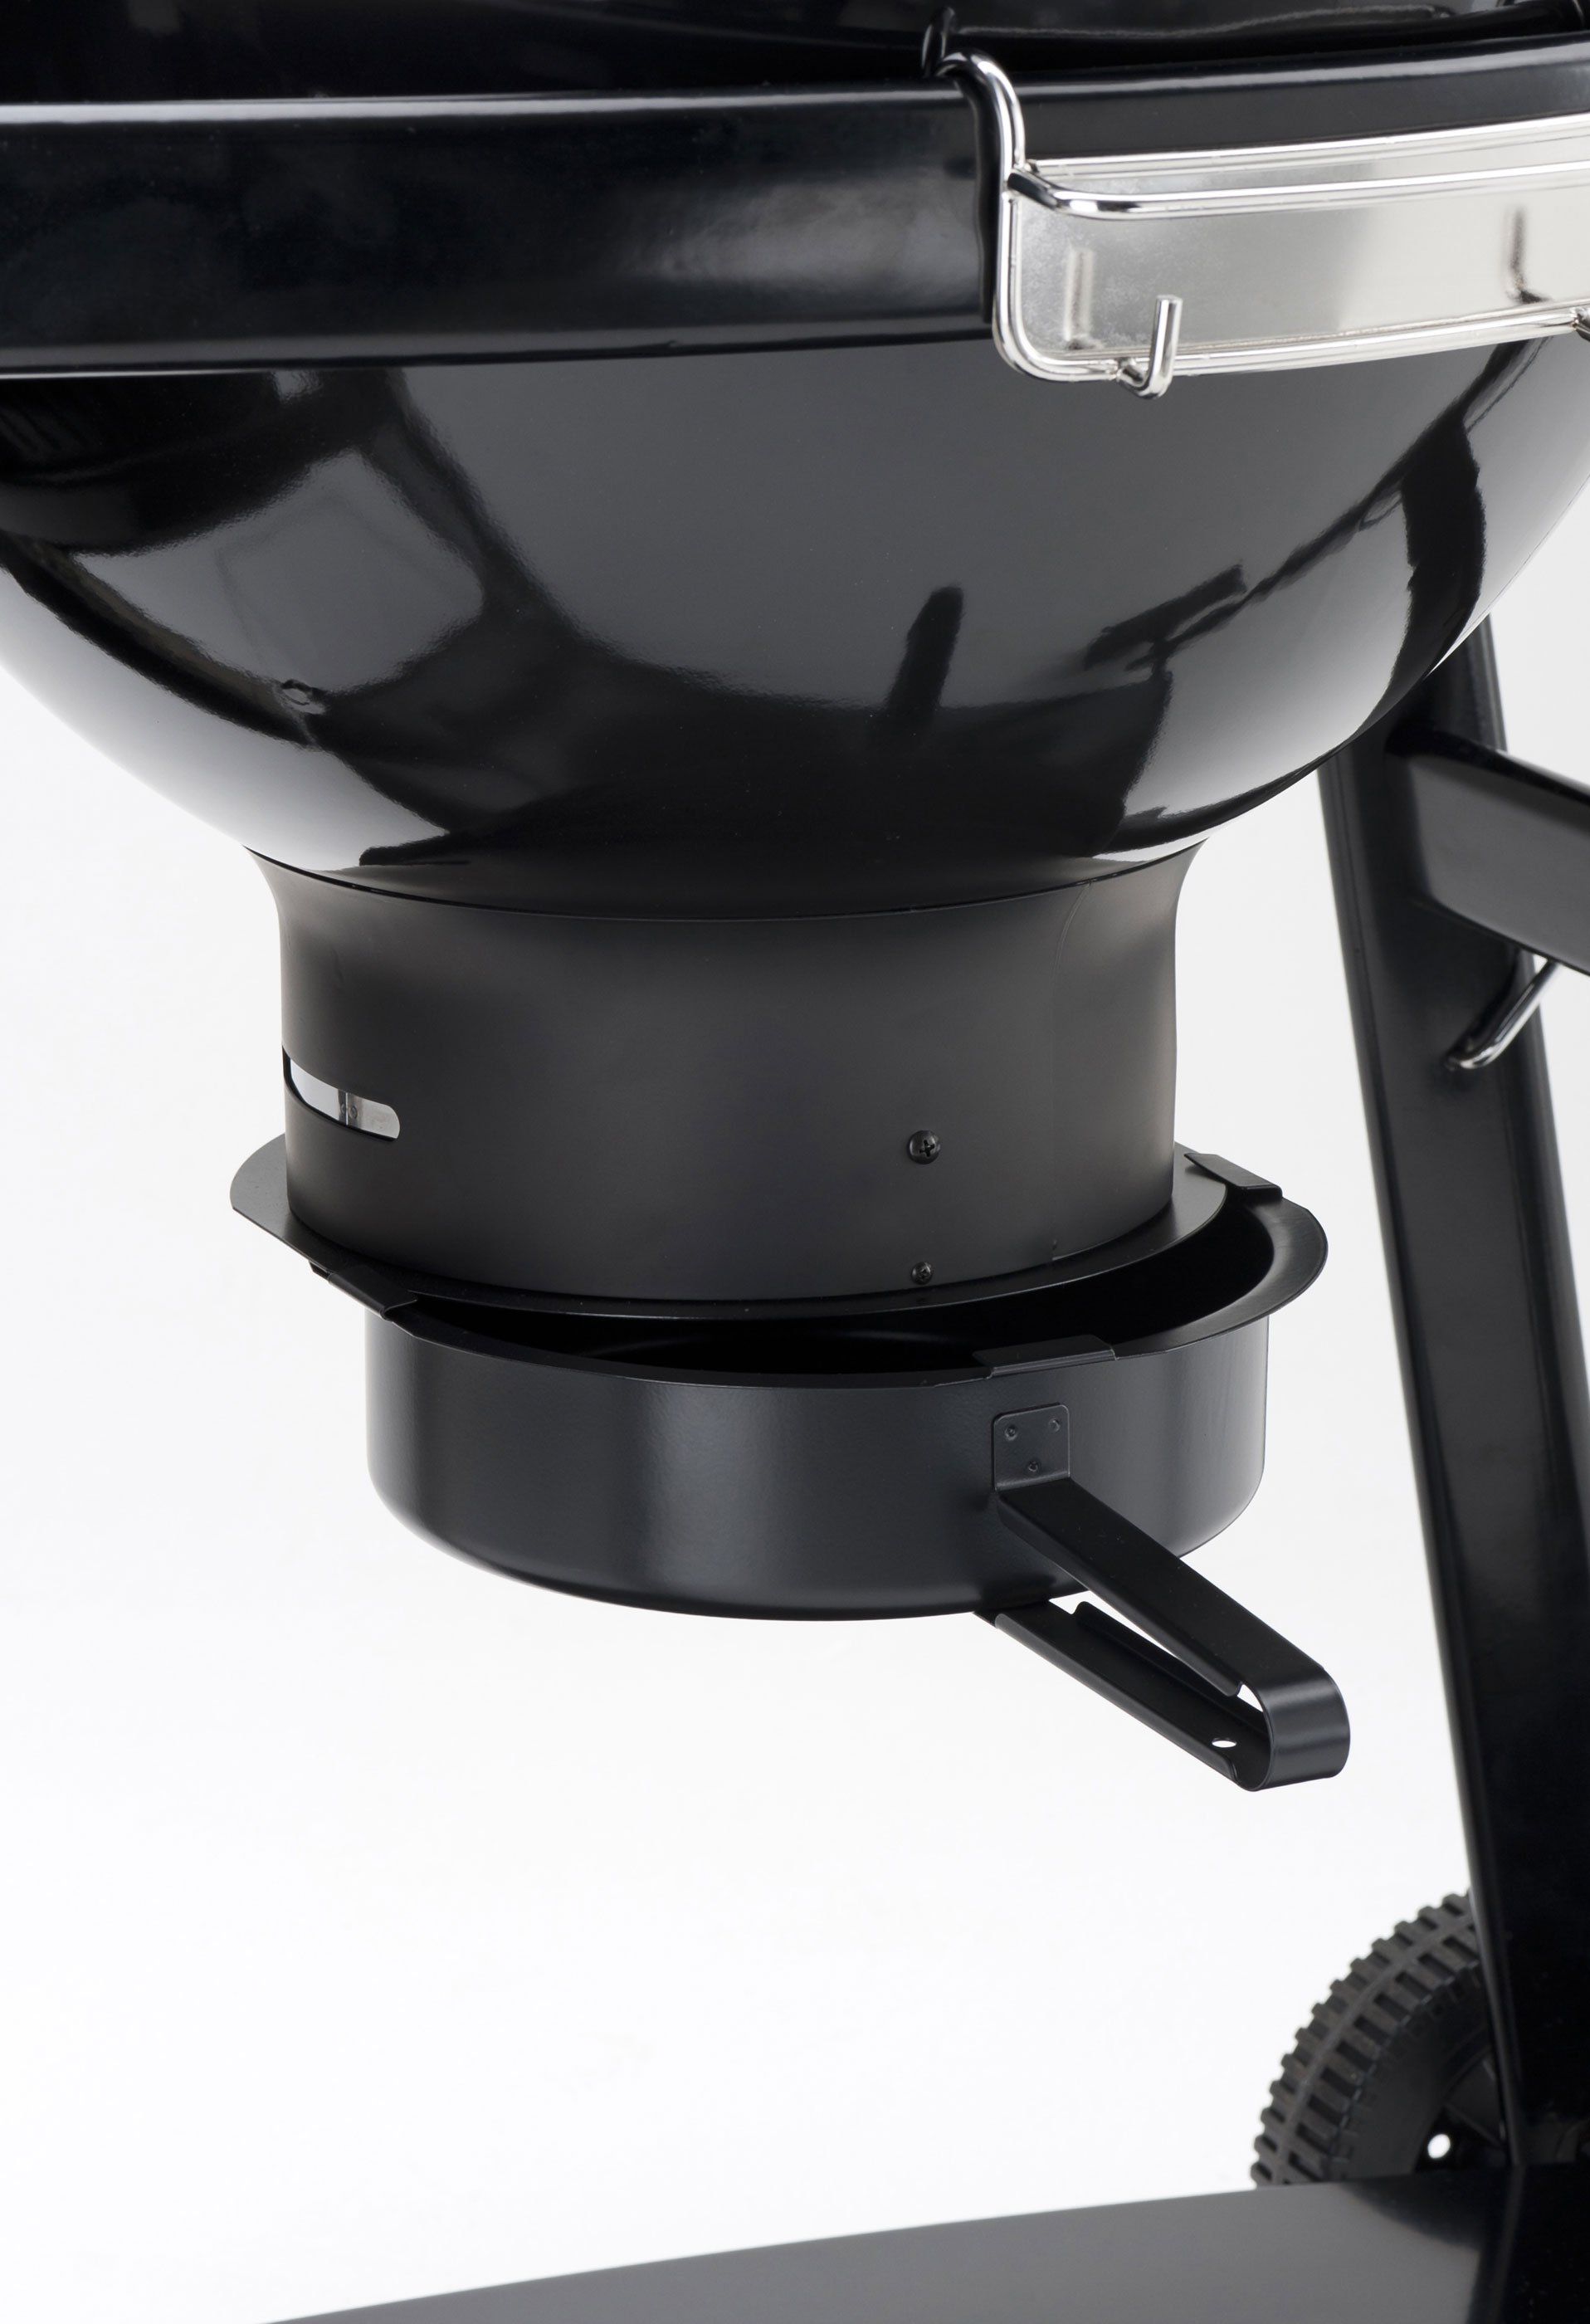 Landmann Holzkohlegrill / Kugelgrill Black Pearl Select Ø 56cm 31346 Bild 3